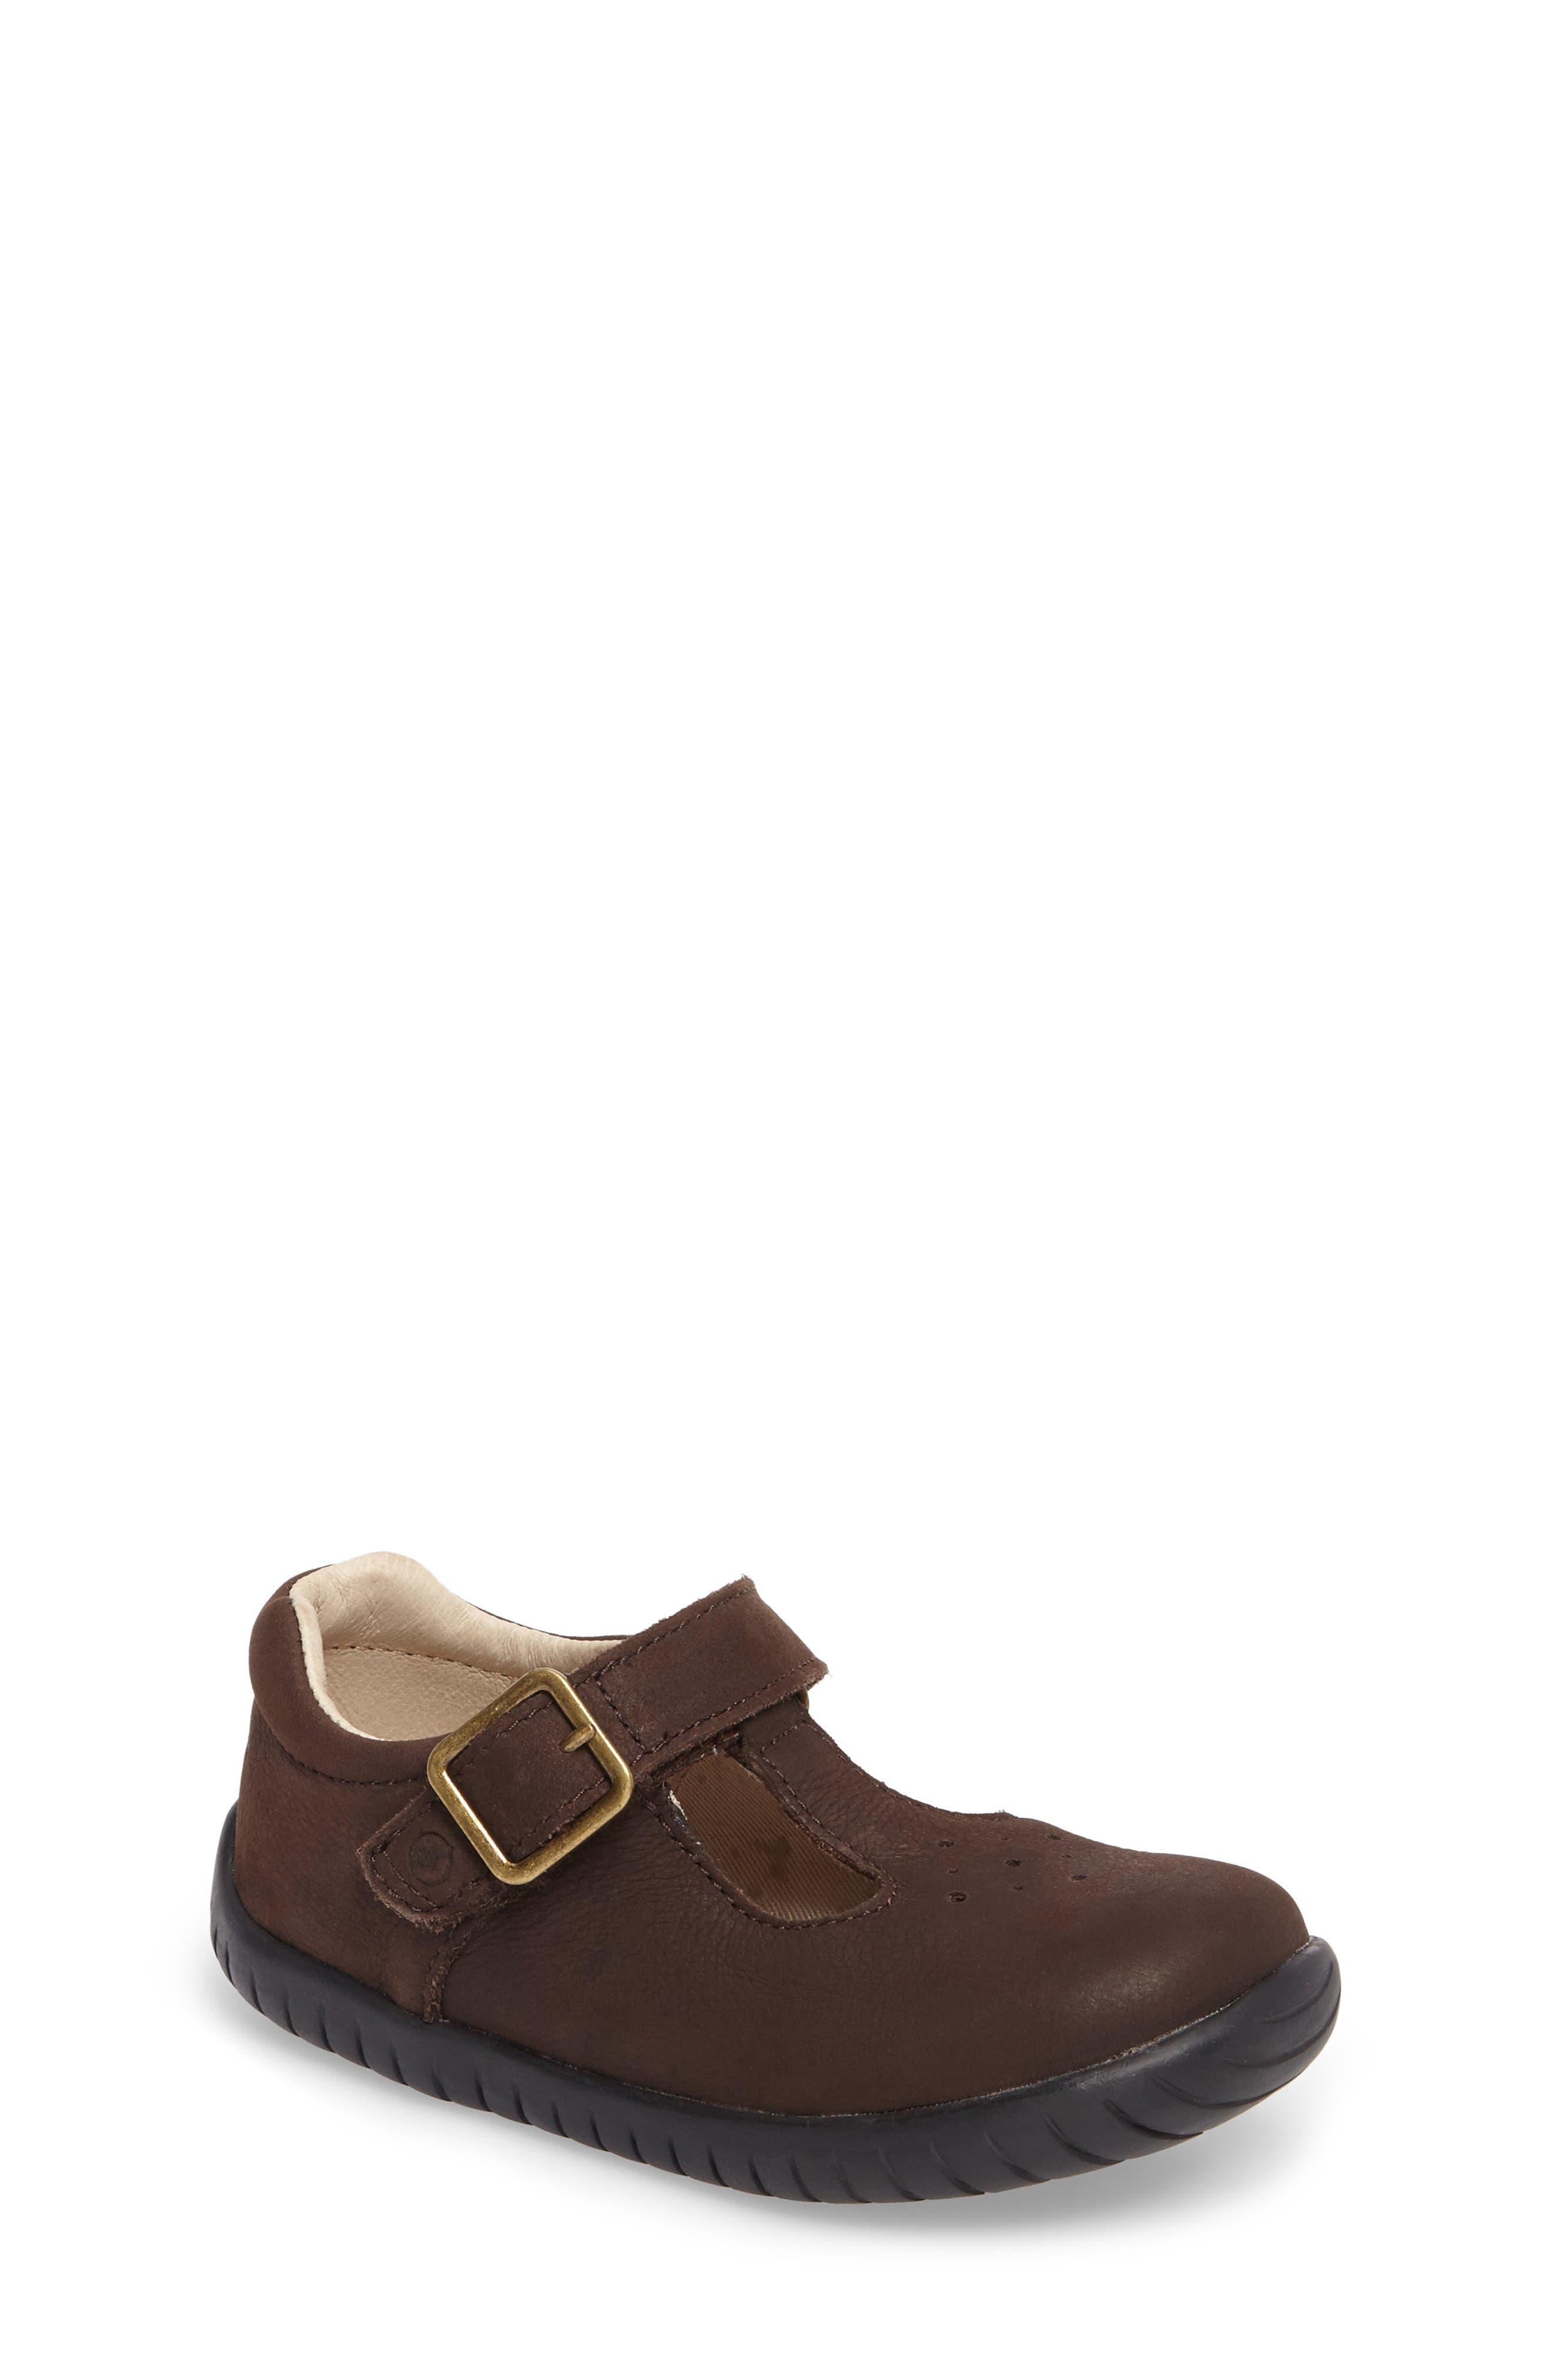 Lindsay Mary Jane Sneaker,                             Main thumbnail 1, color,                             200